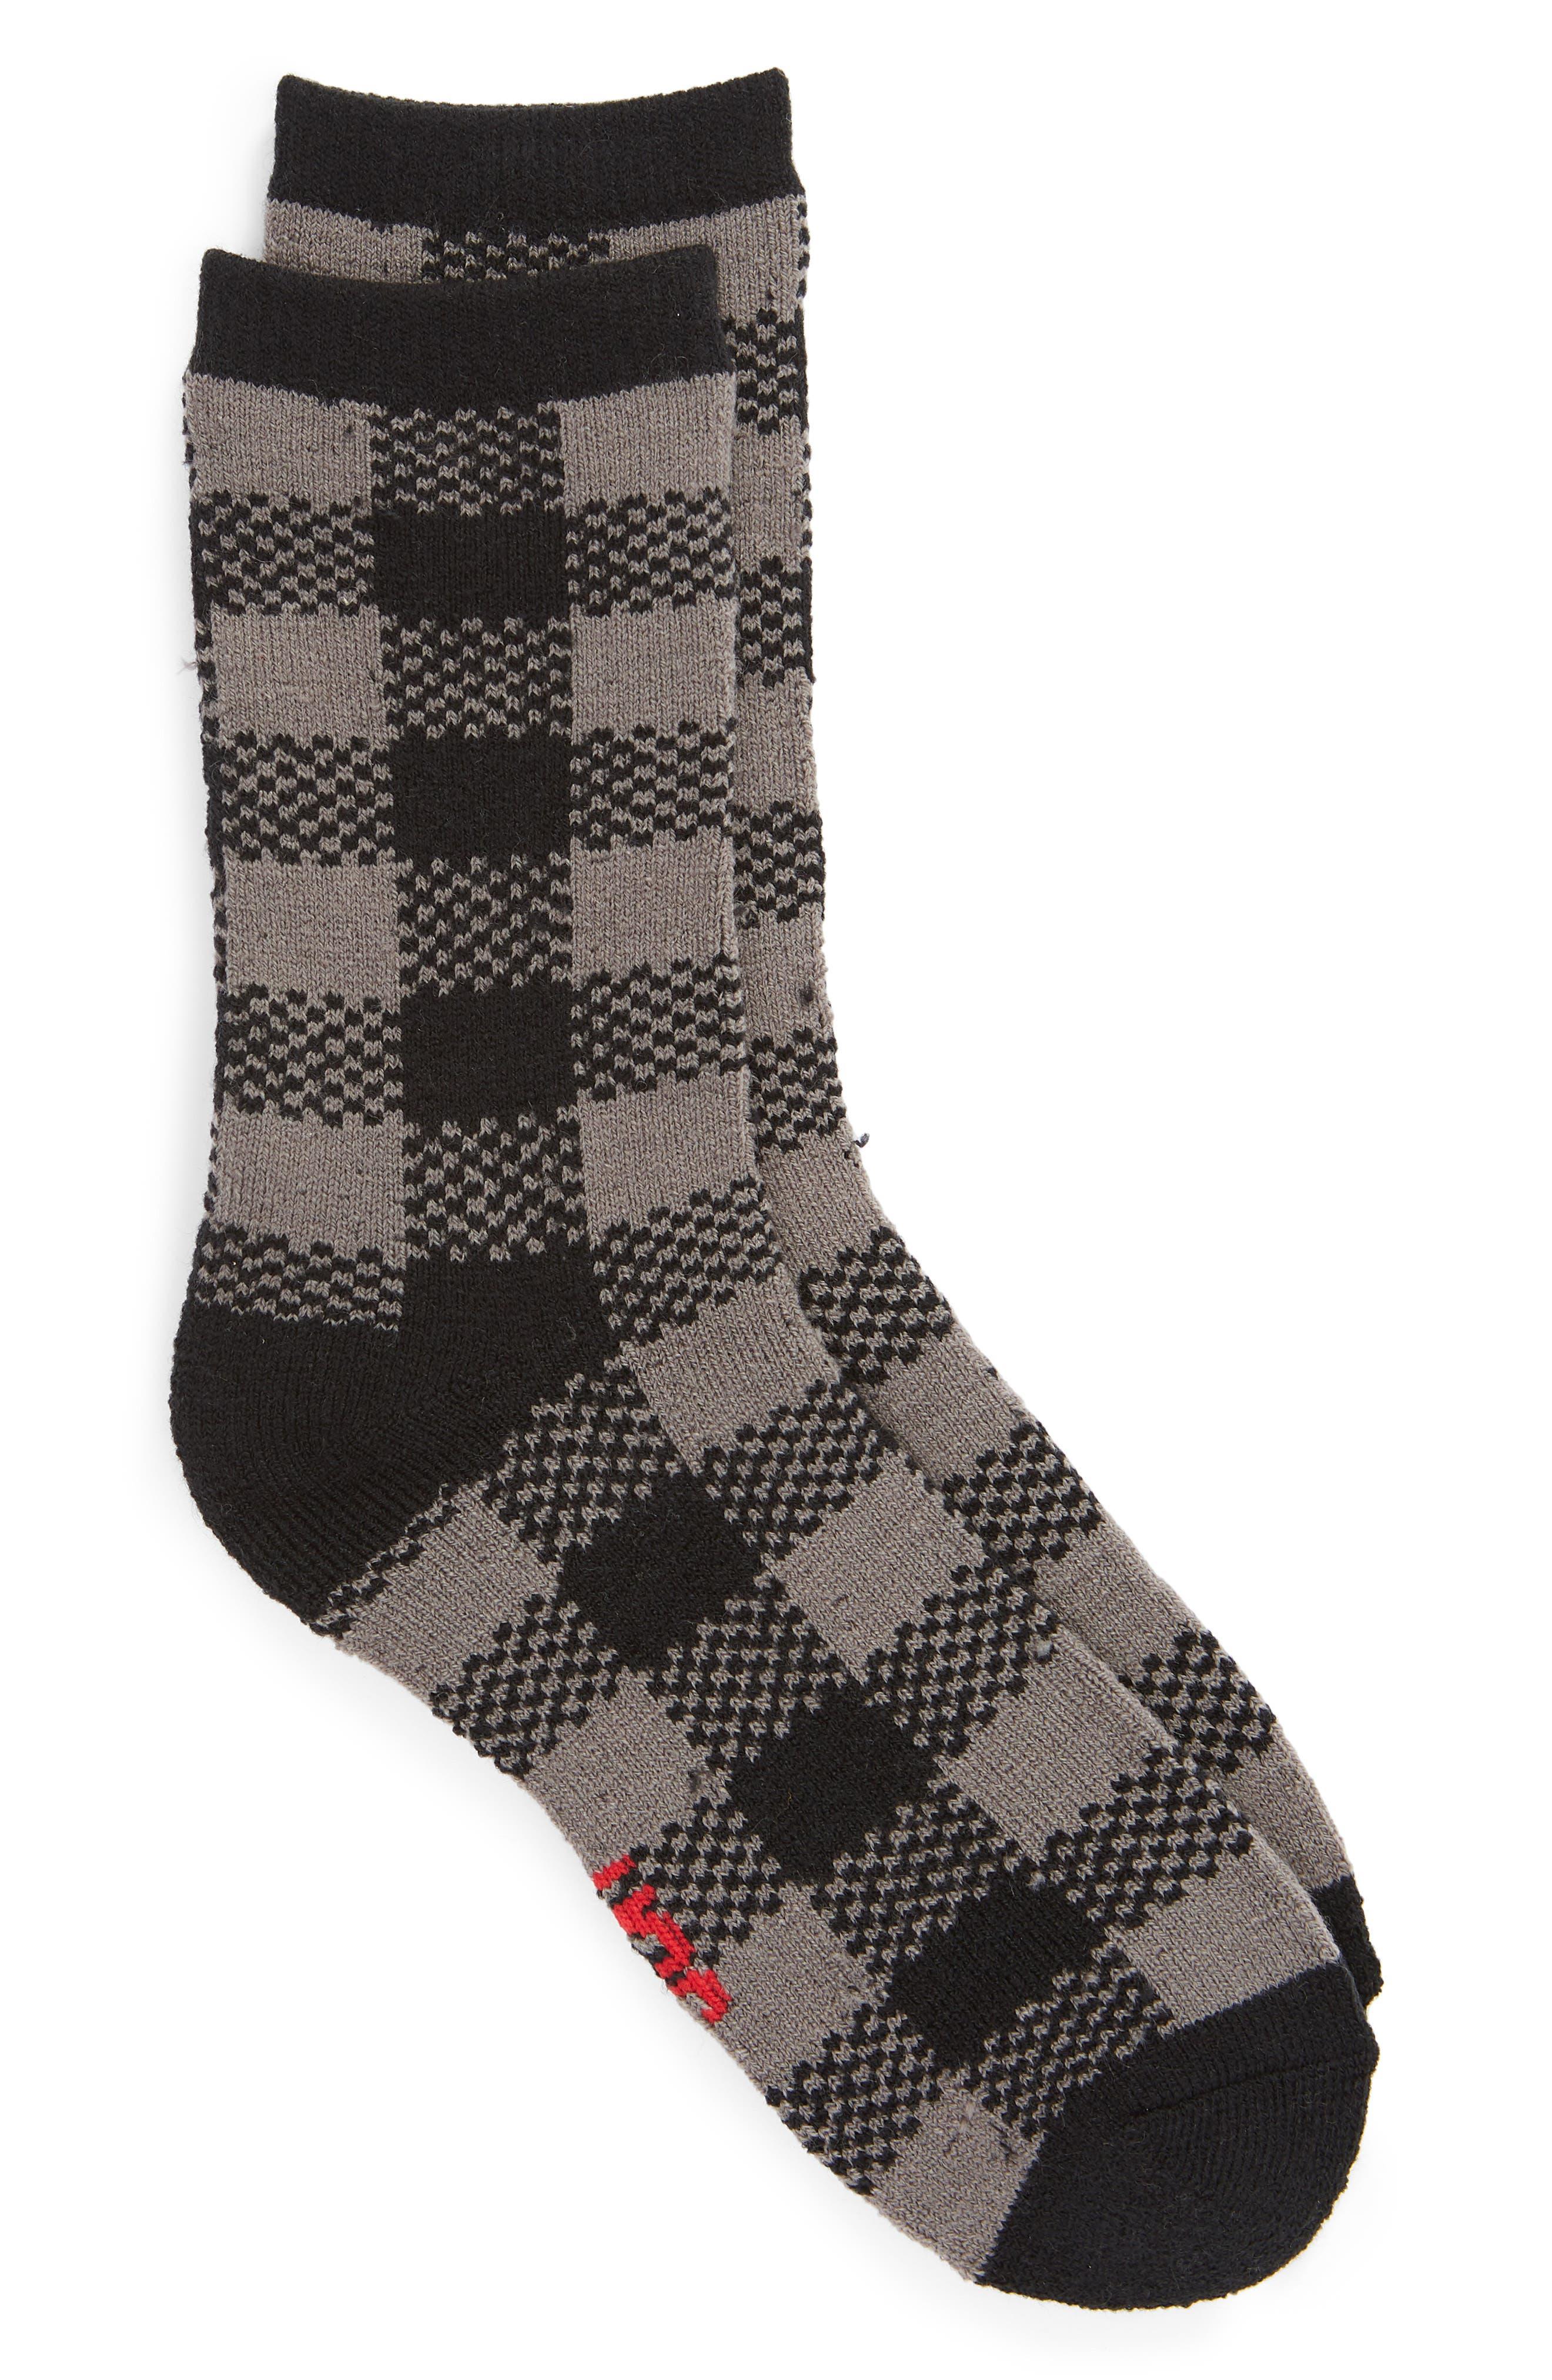 Randall Check Crew Socks,                             Main thumbnail 1, color,                             BLACK